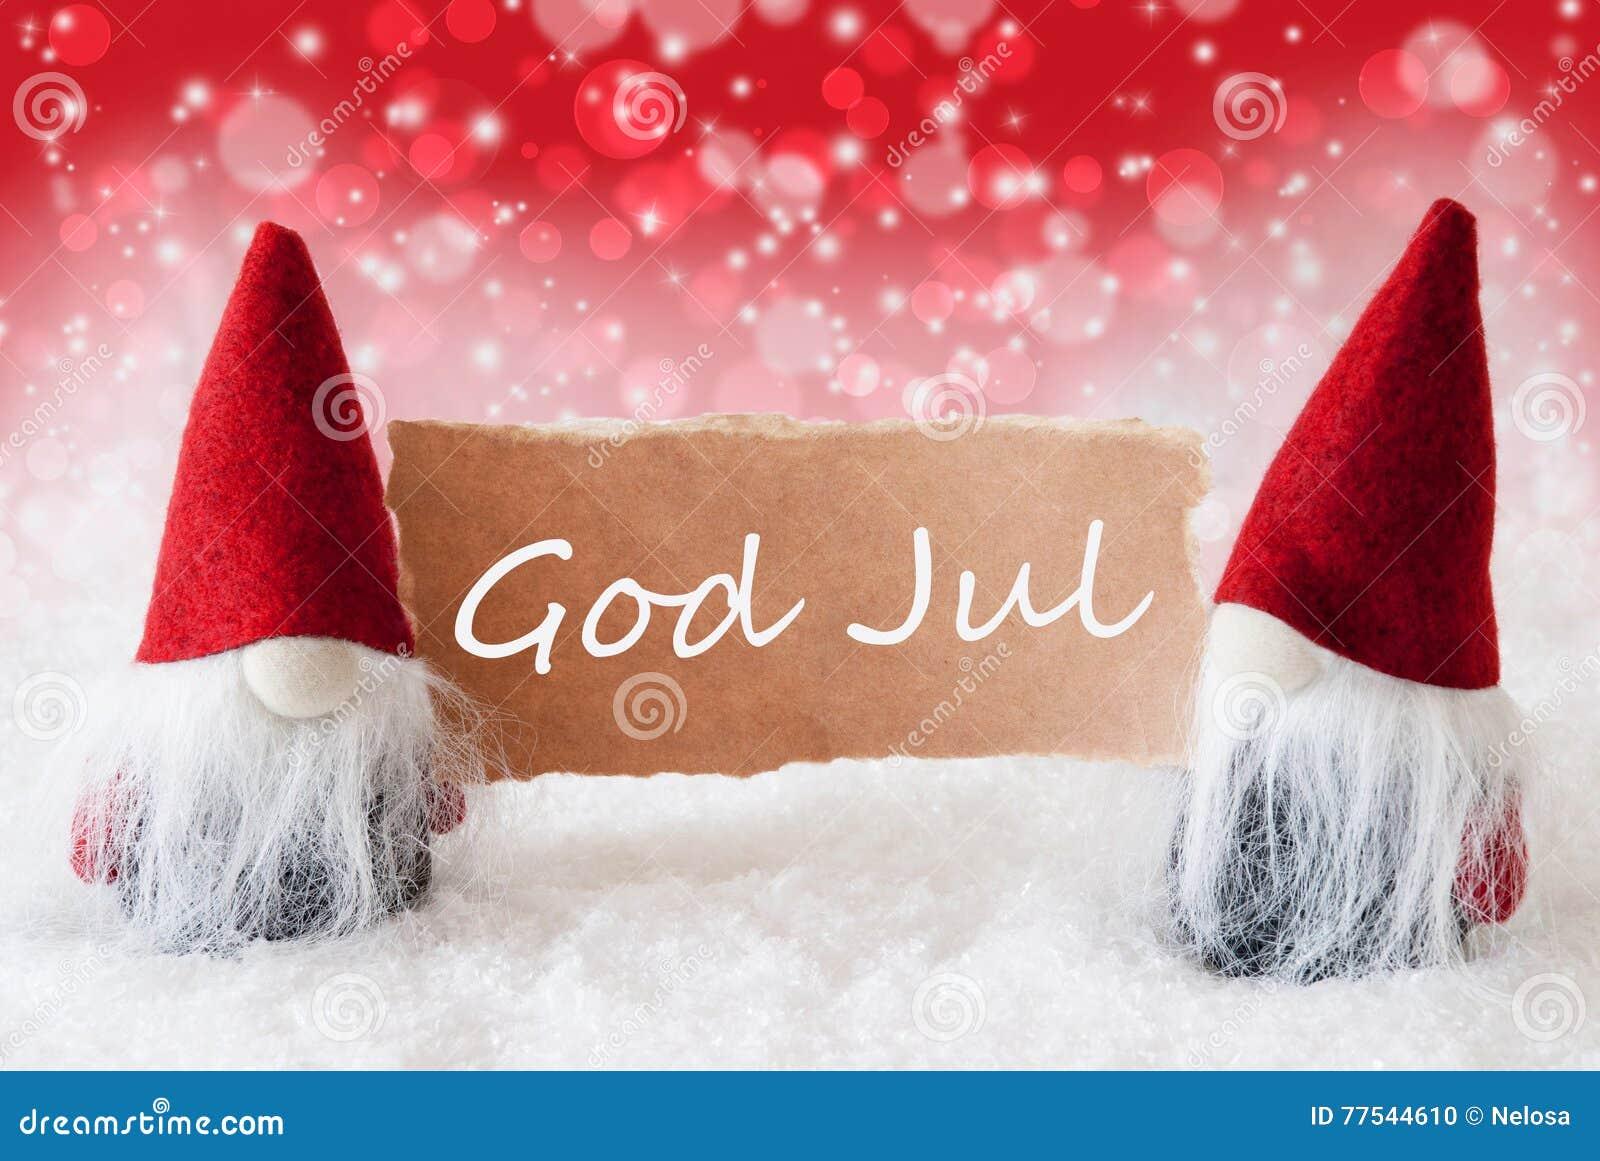 rote christmassy gnomen mit karte gott jul bedeutet frohe. Black Bedroom Furniture Sets. Home Design Ideas